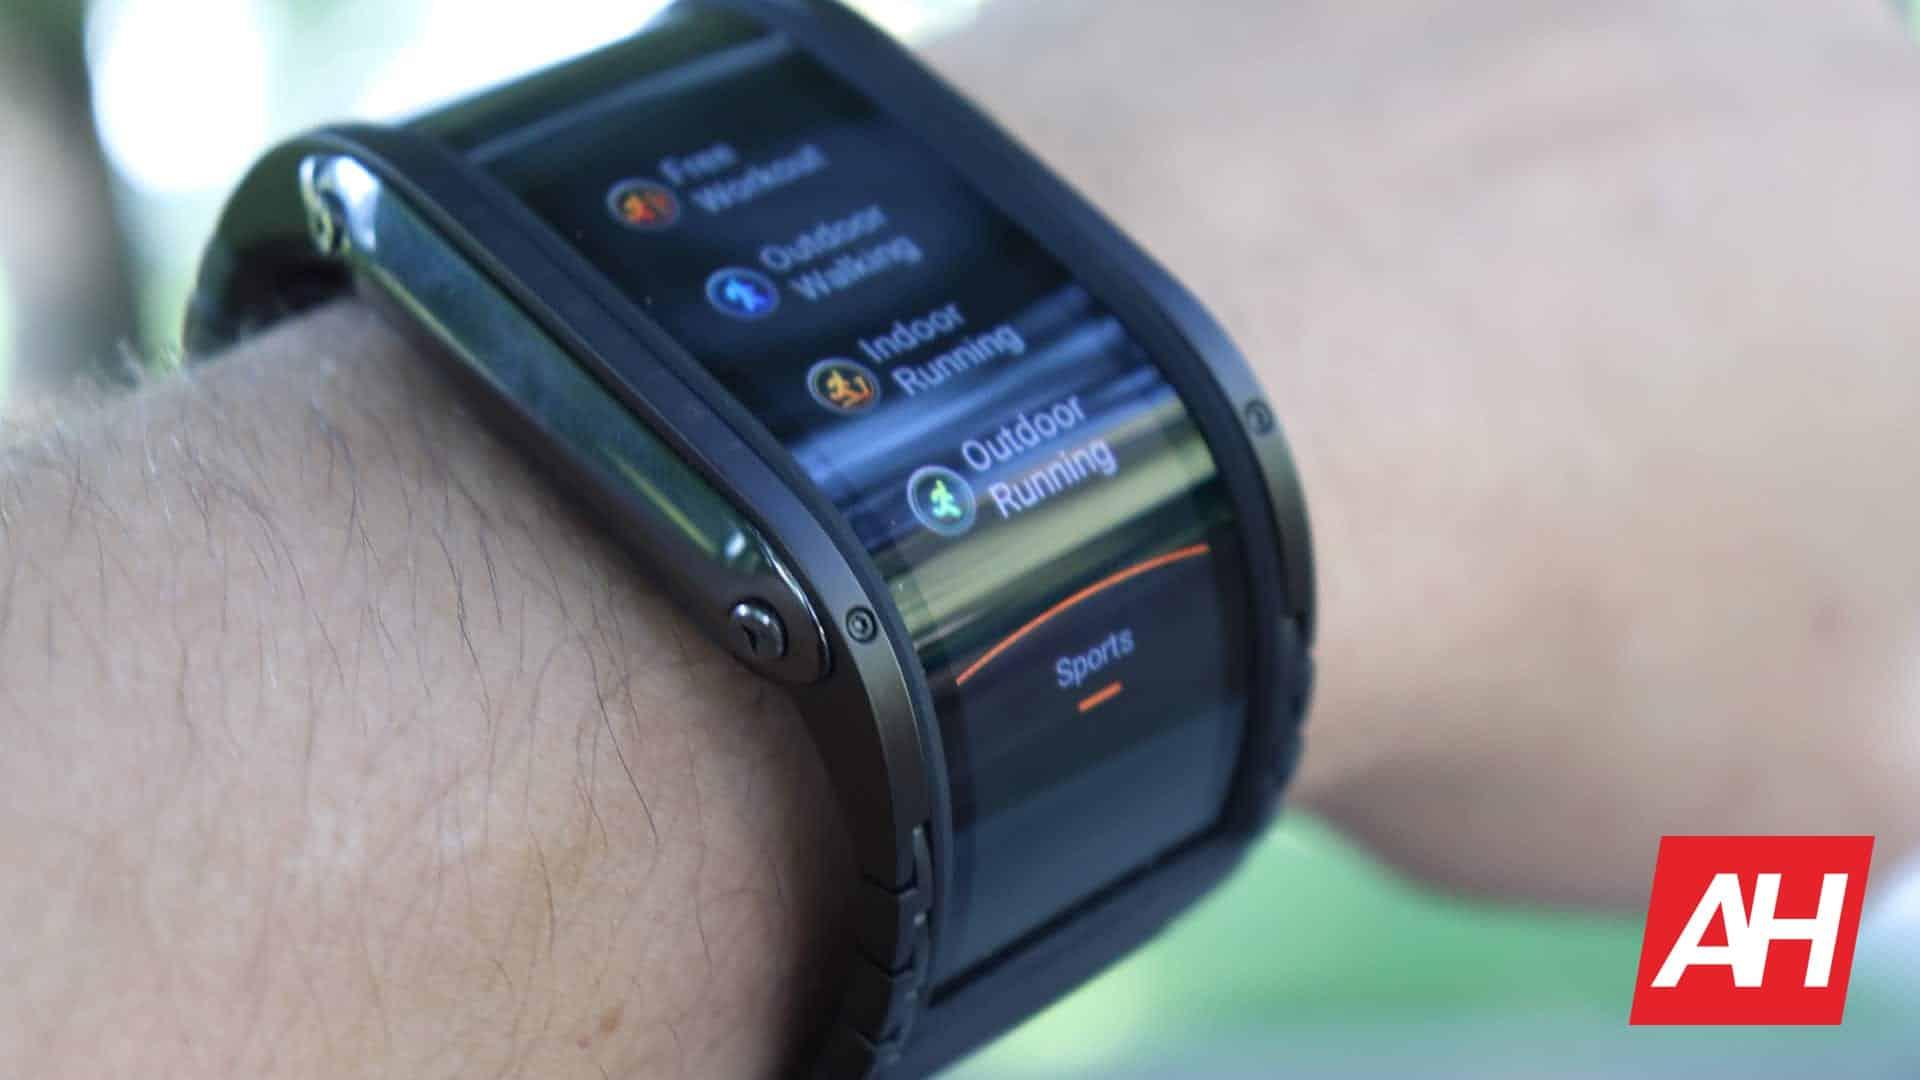 05 Nubia Watch Review Software DG AH 2020